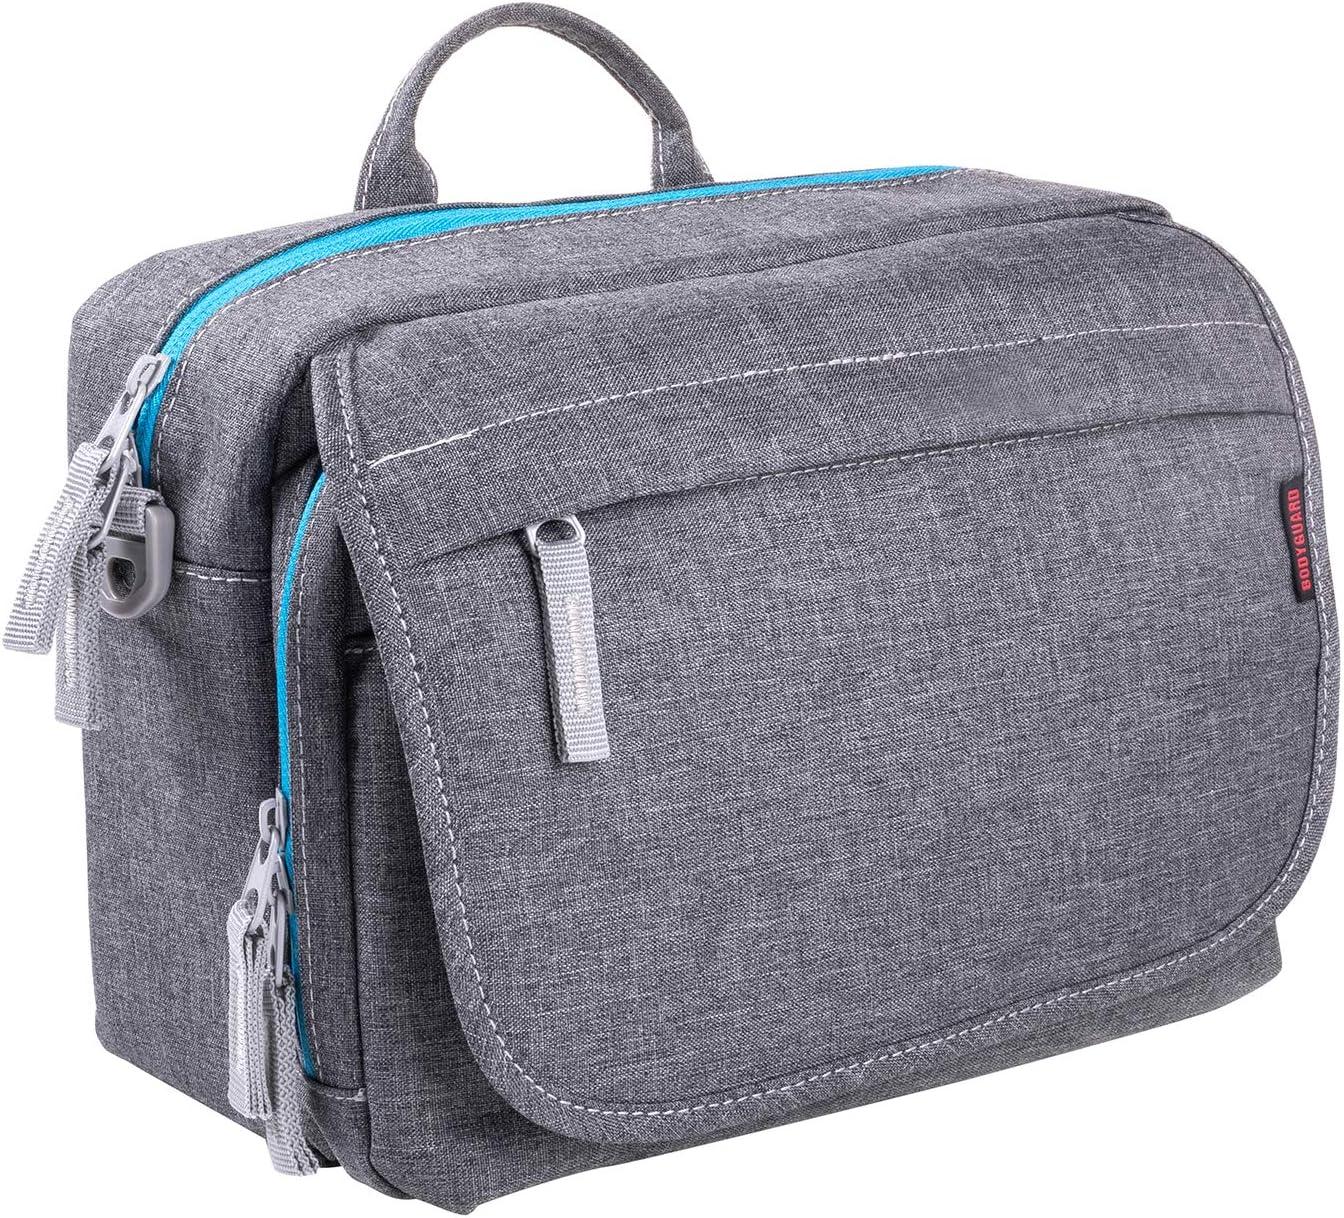 Bodyguard Slr Messenger Bag Kameratasche Für Kamera